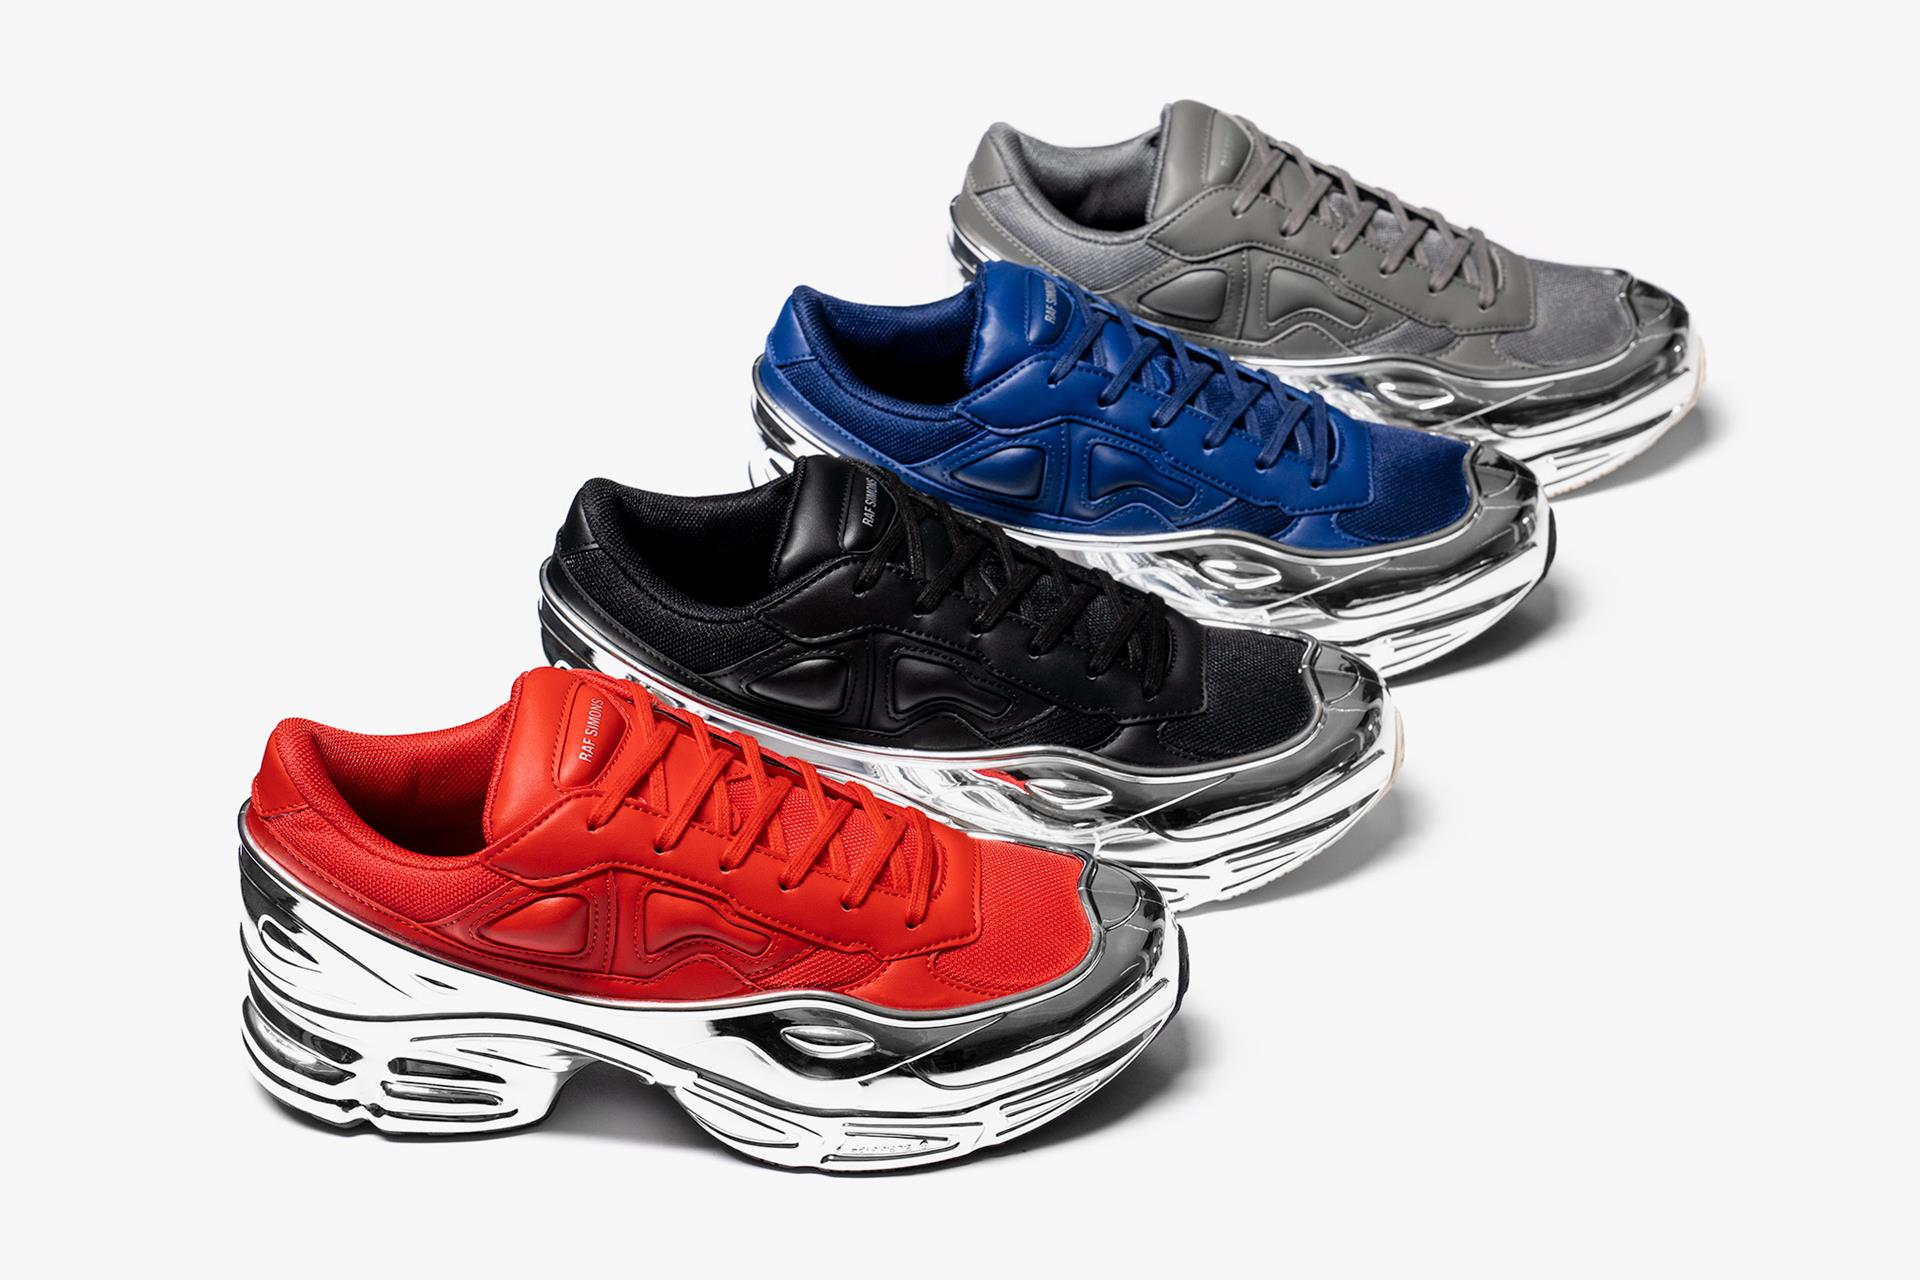 adidas x Raf Simons Ozweego Chrome Pack | Release Date: 05.23.19